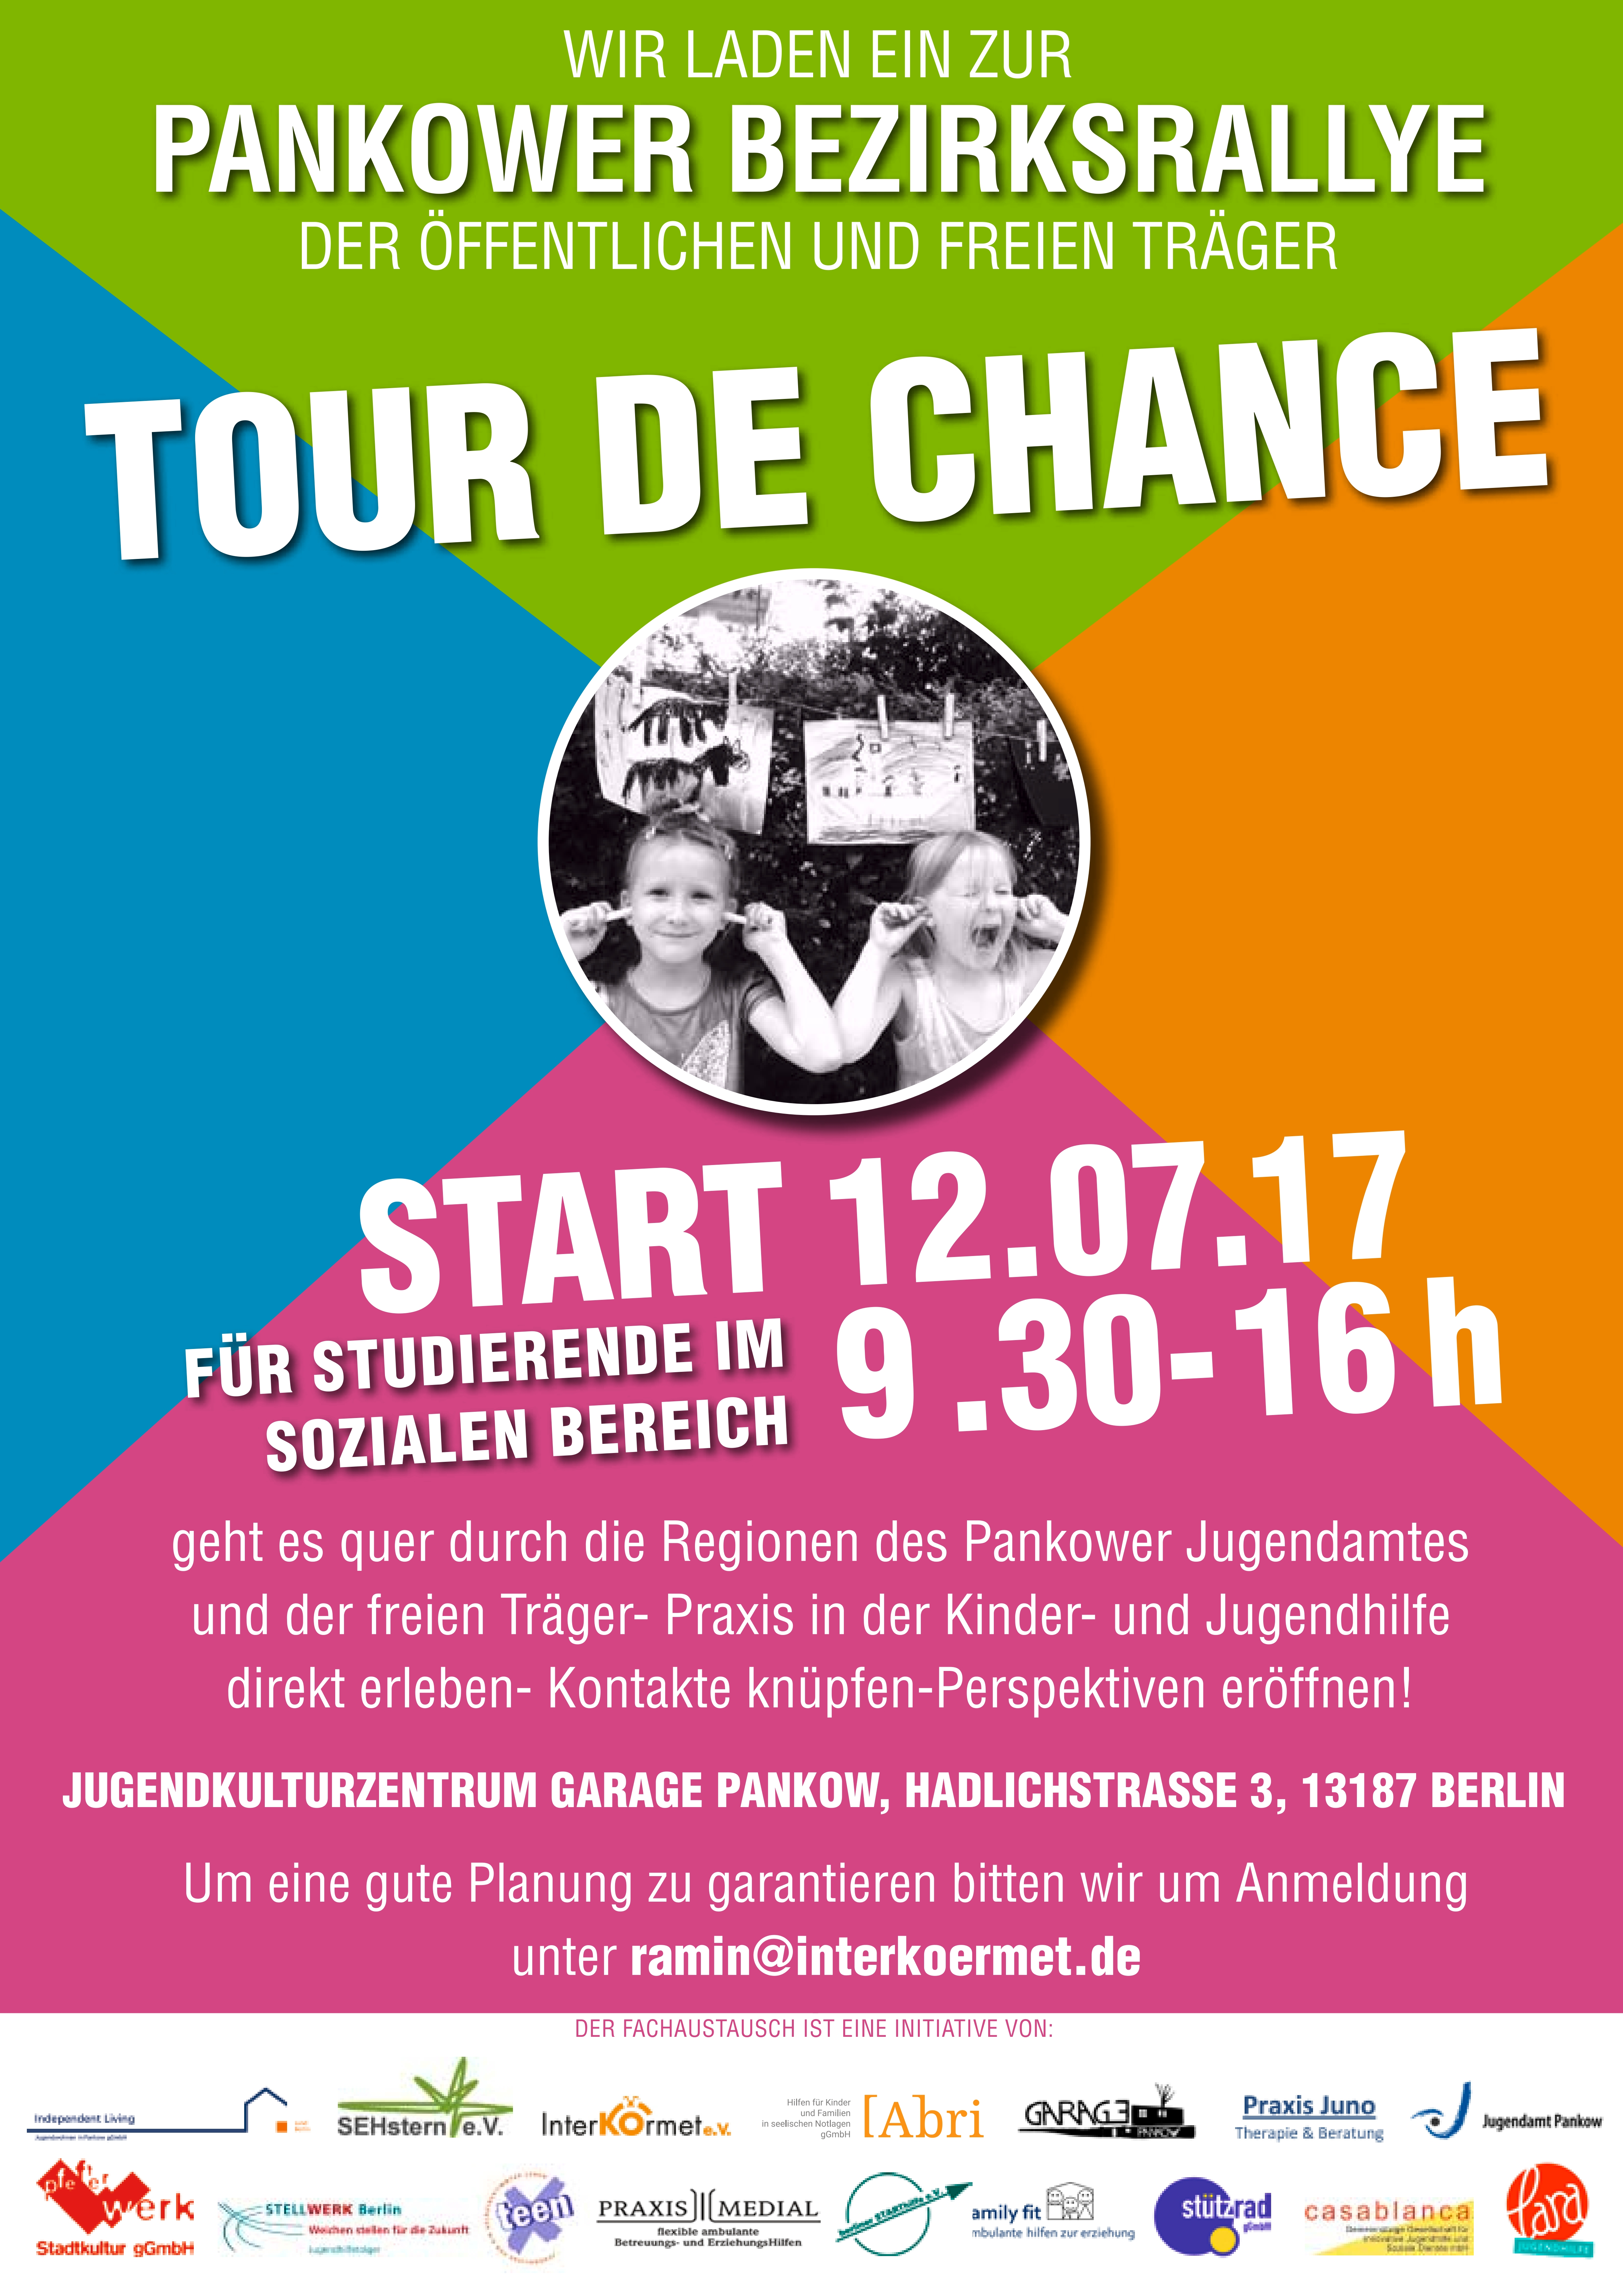 Tour de Chance Poster klein 12.7.2017_001